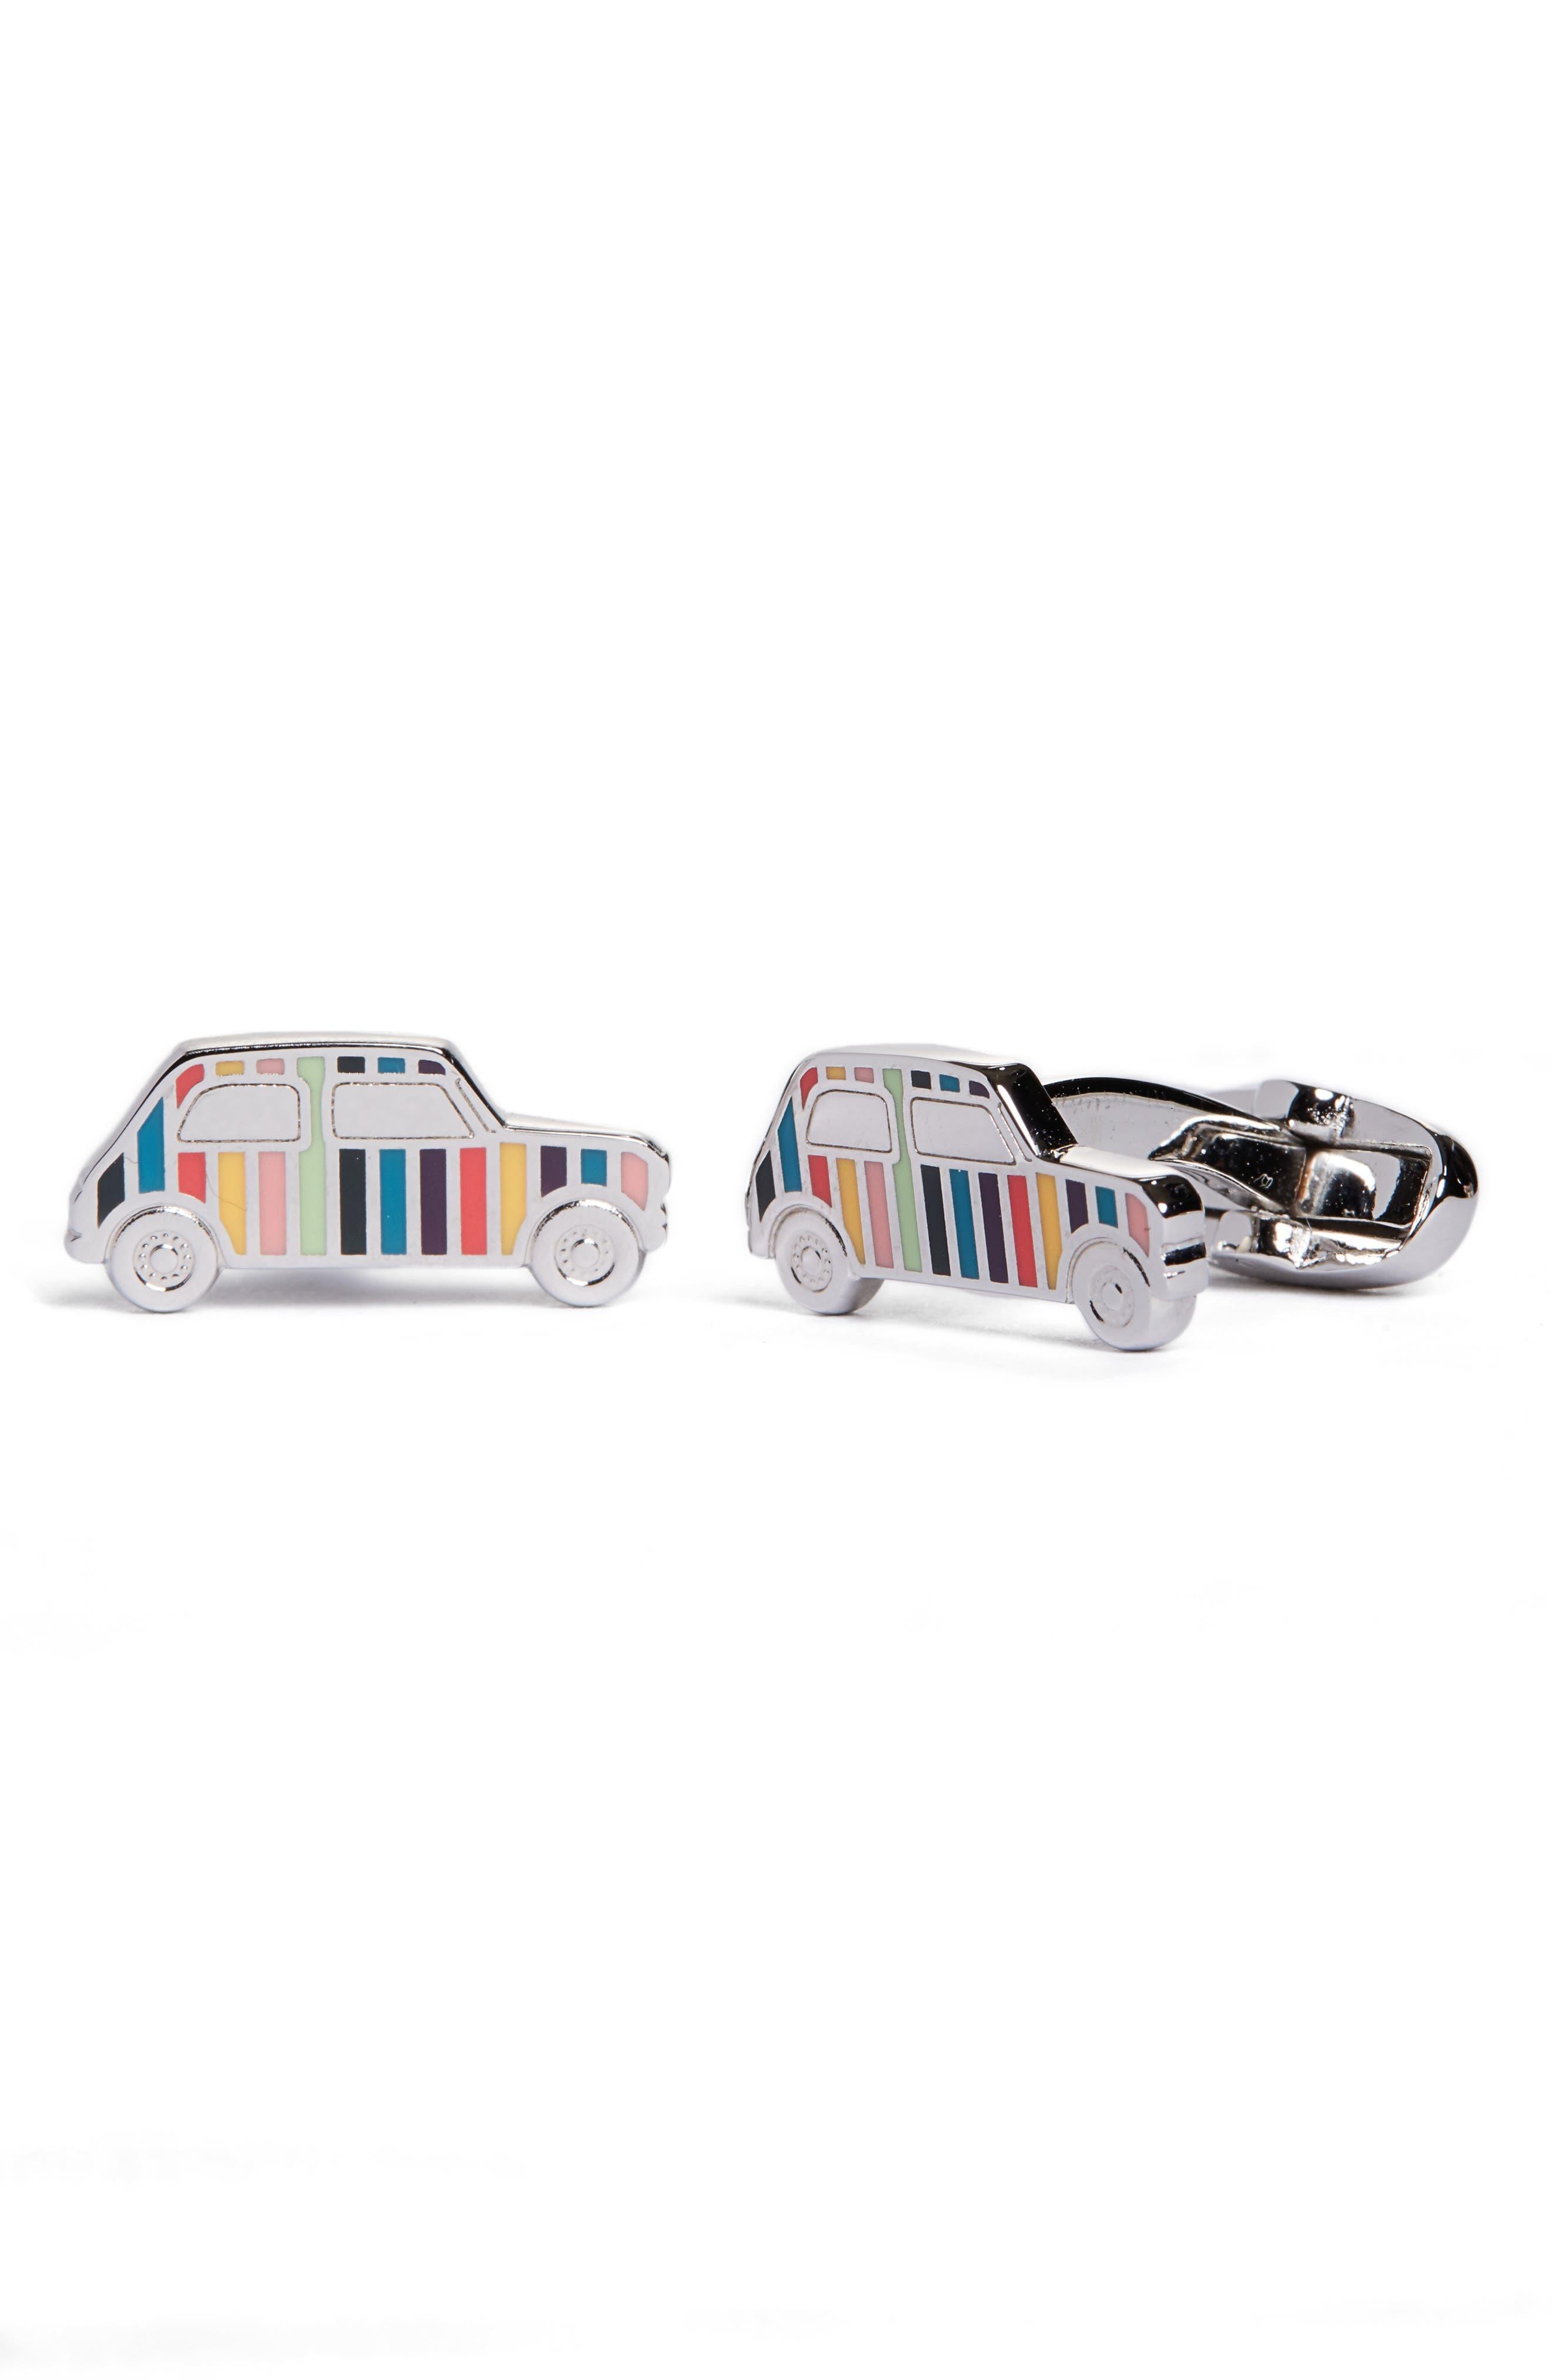 Main Image - Paul Smith Enamel Stripe Car Cuff Links